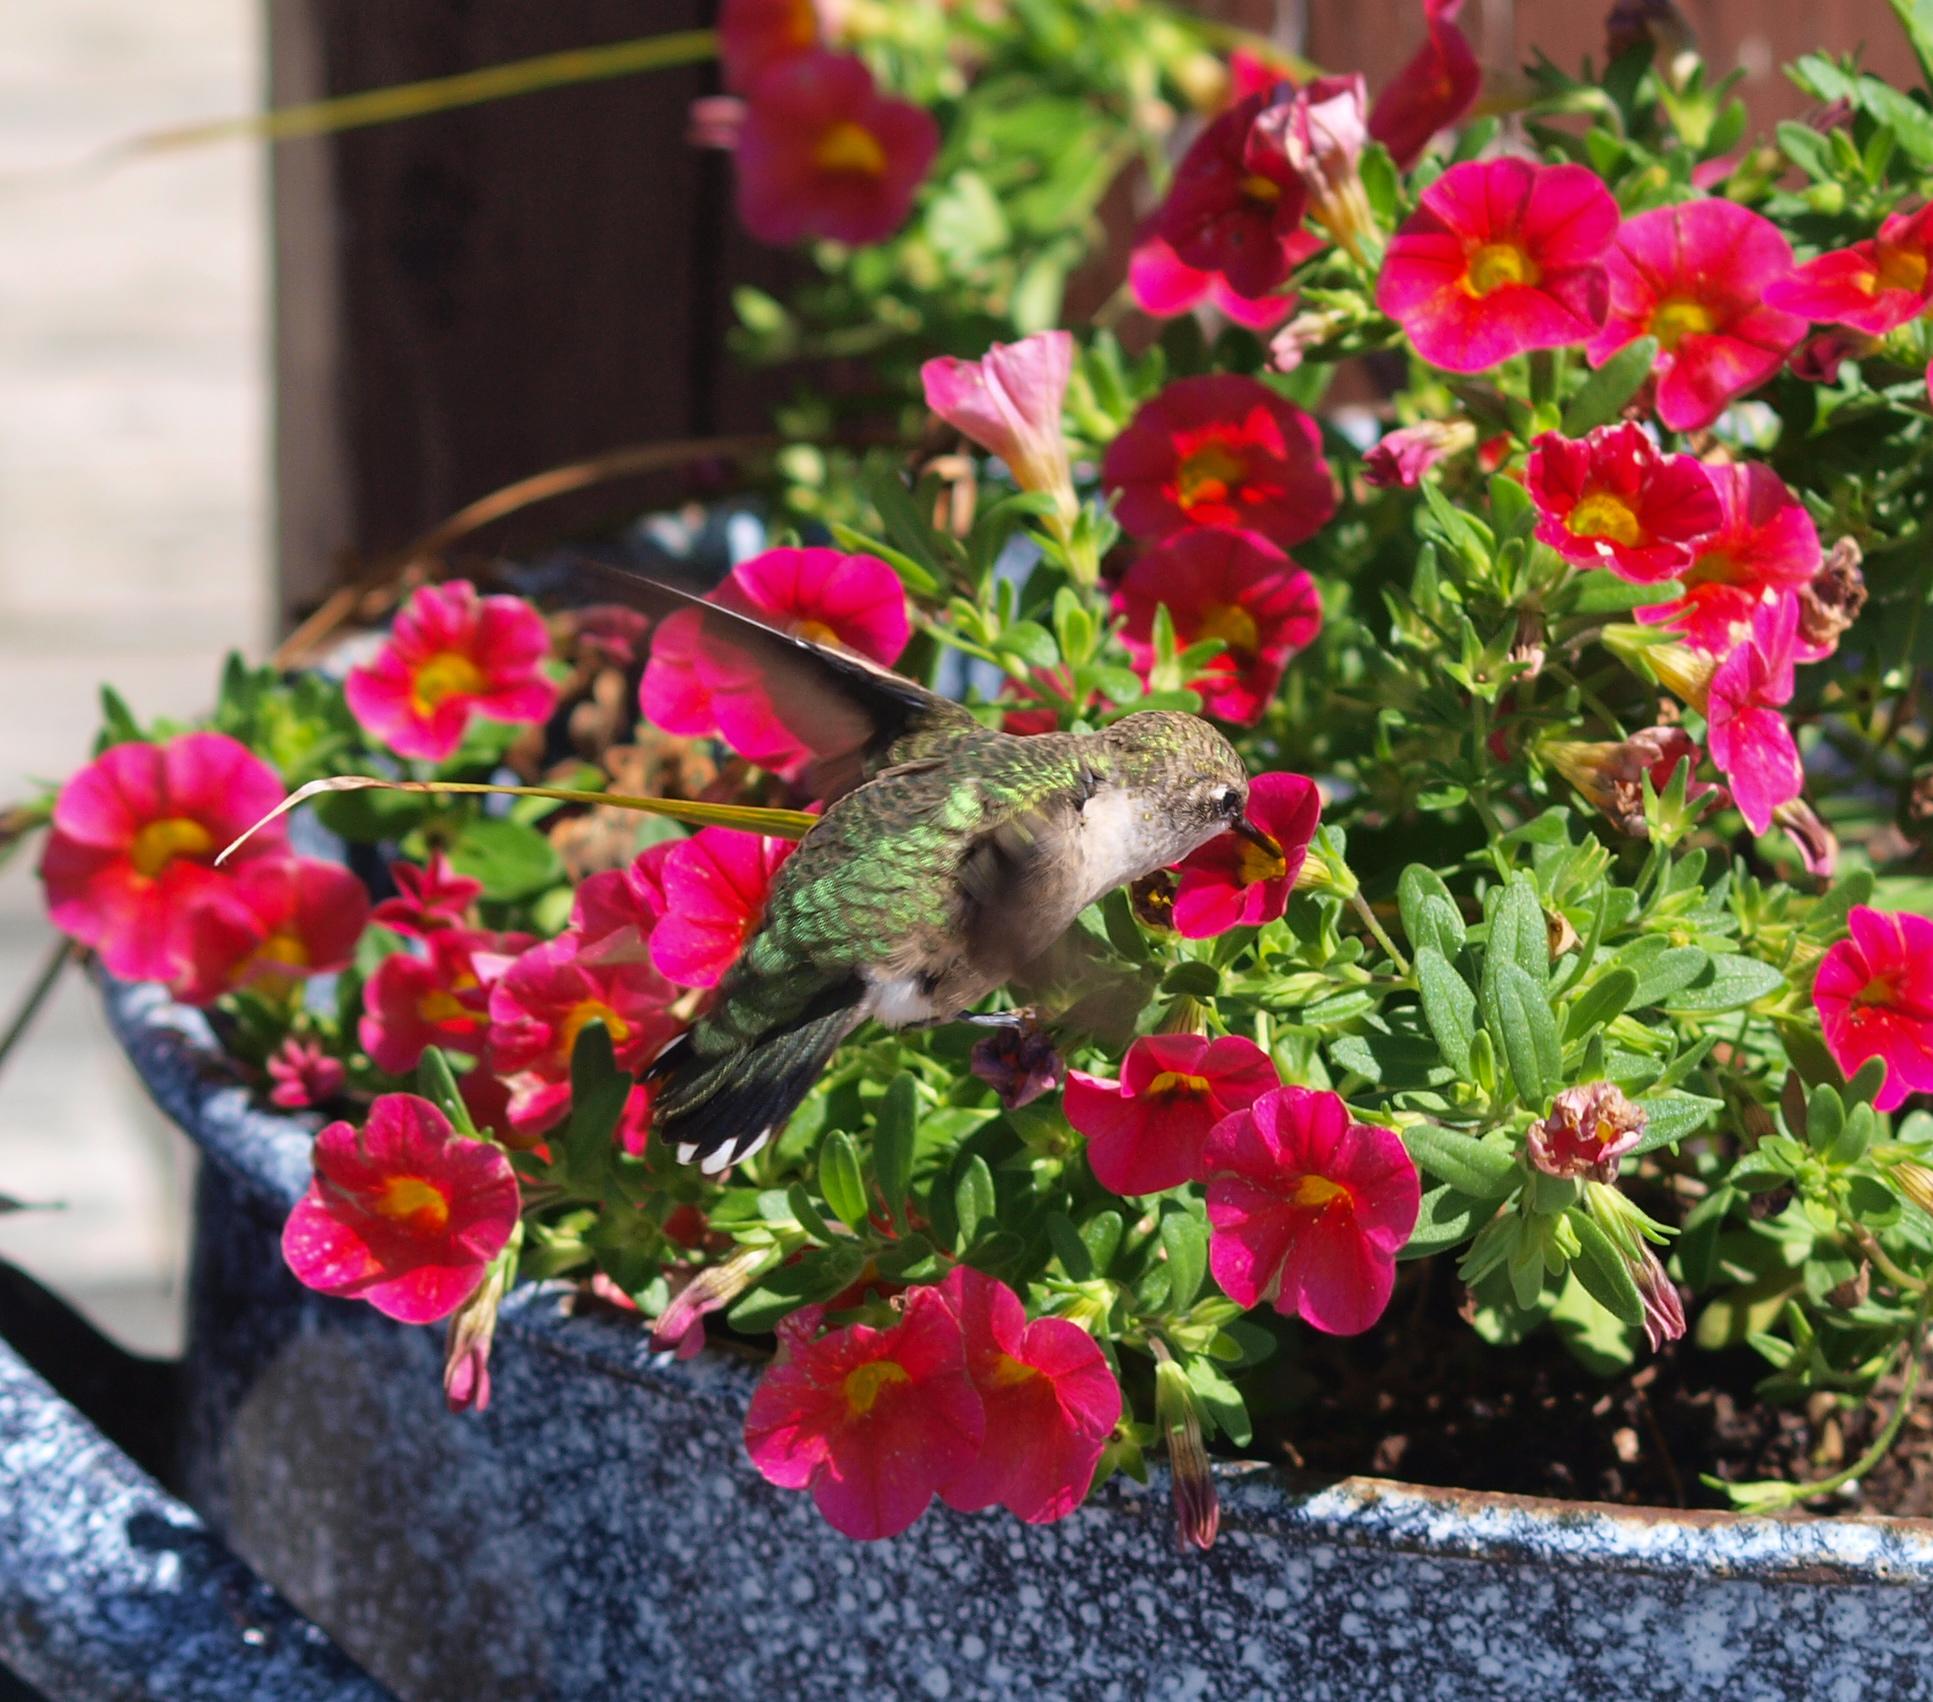 Hummingbird and Blossoms